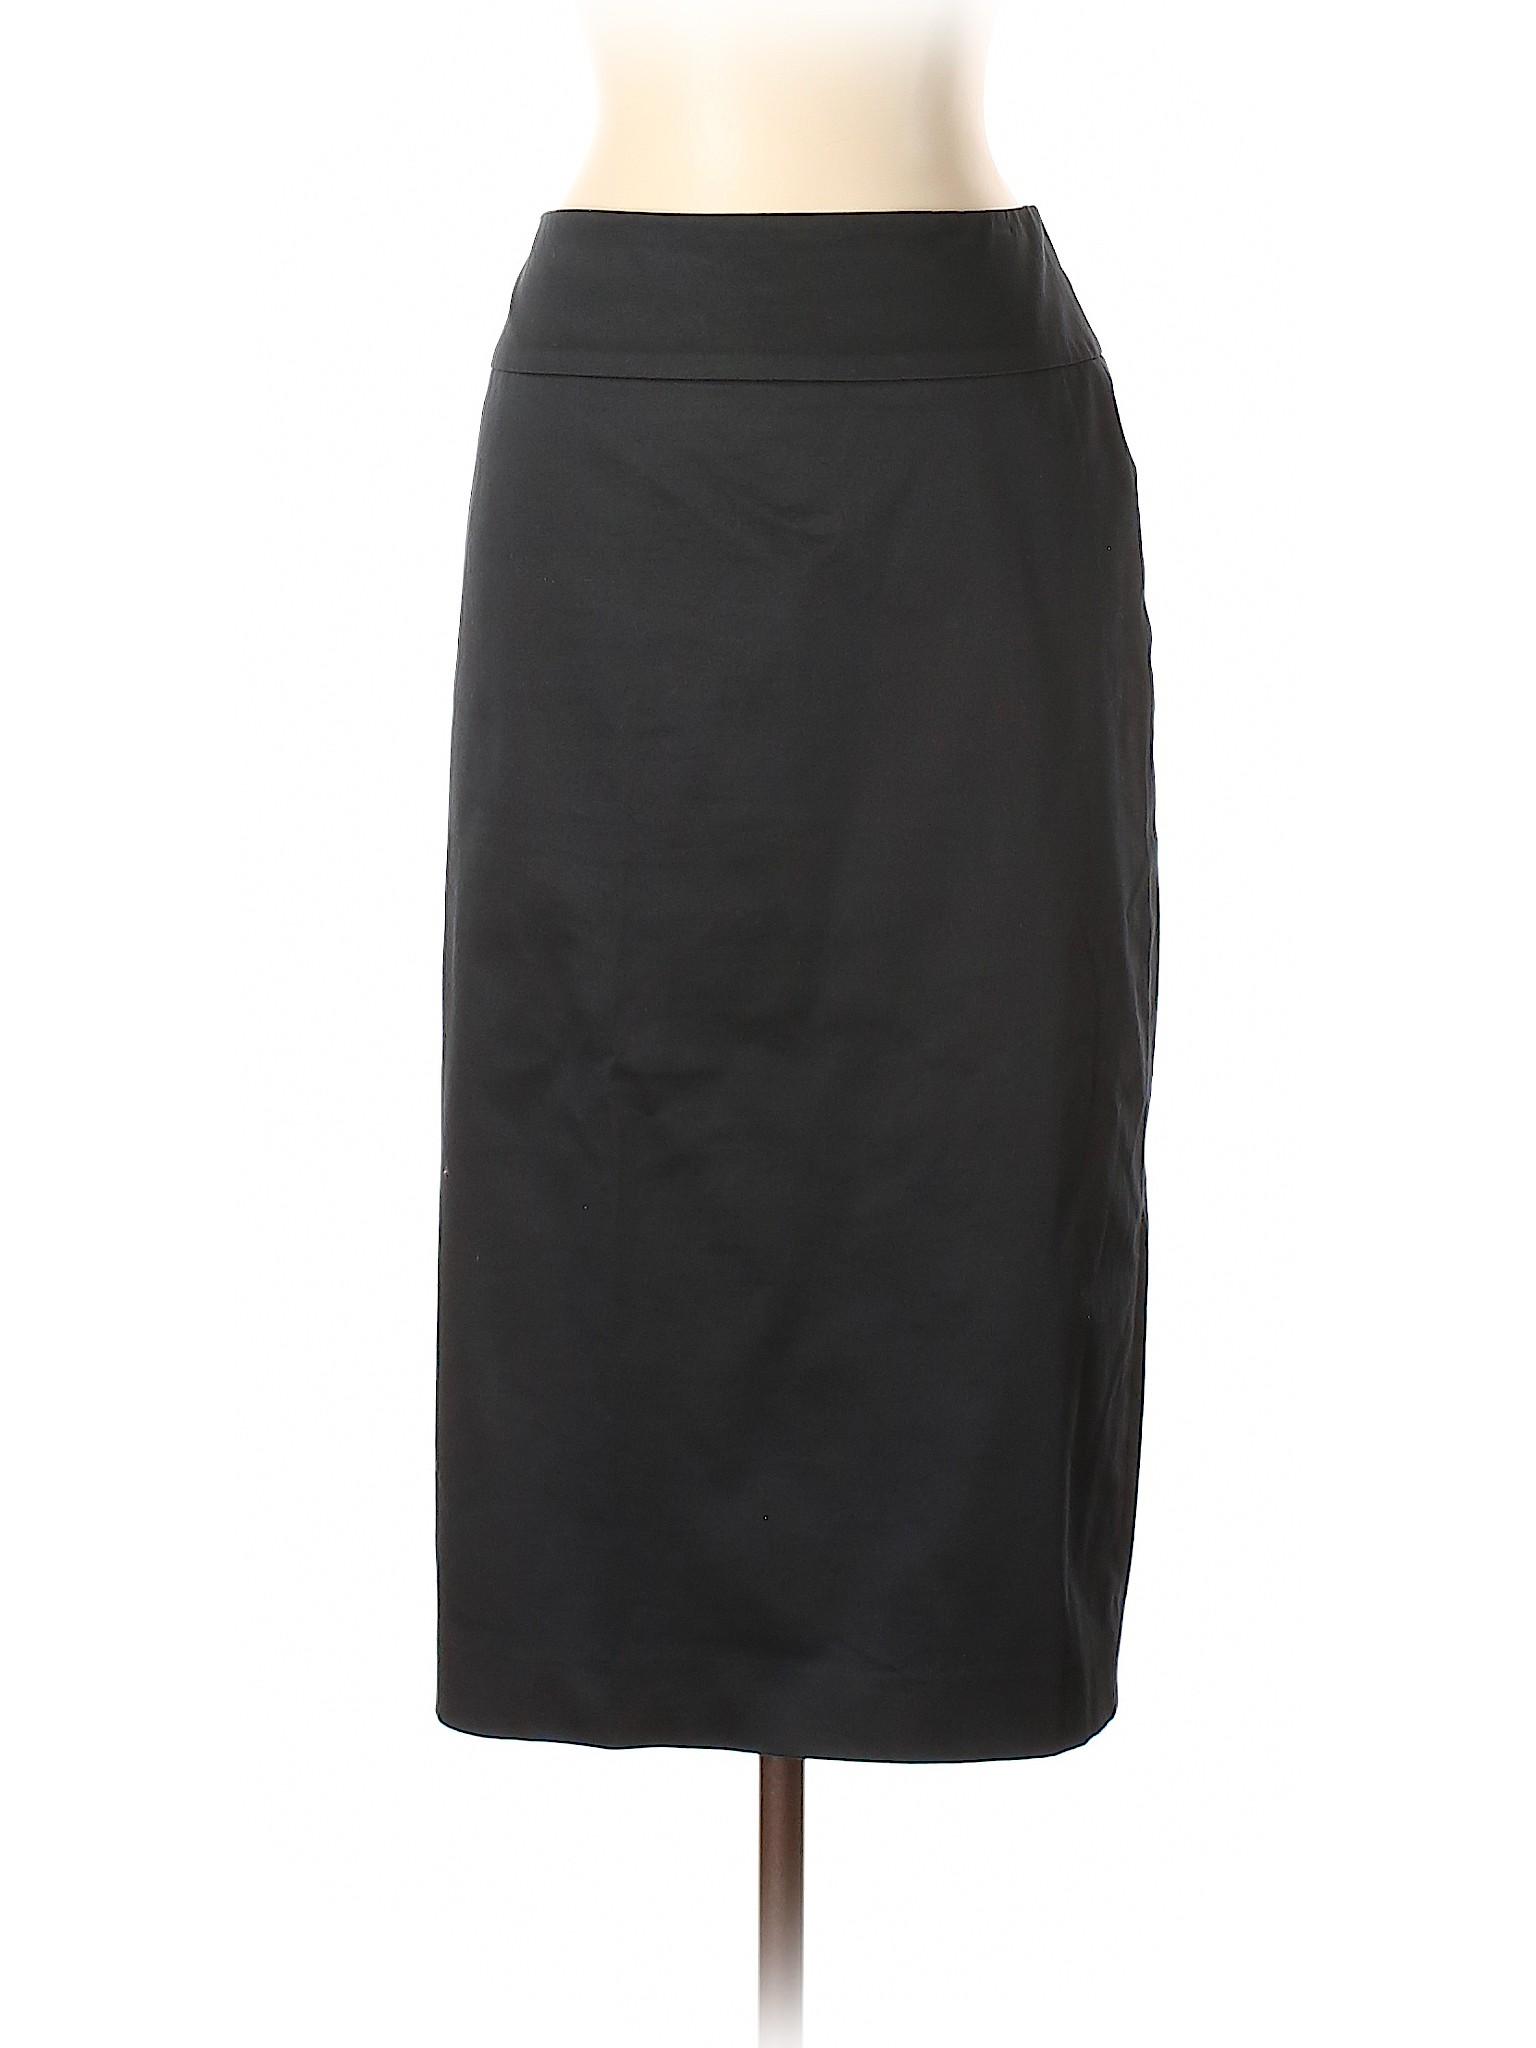 New 148 leisure Skirt York Lafayette Boutique Casual UqTxSxw